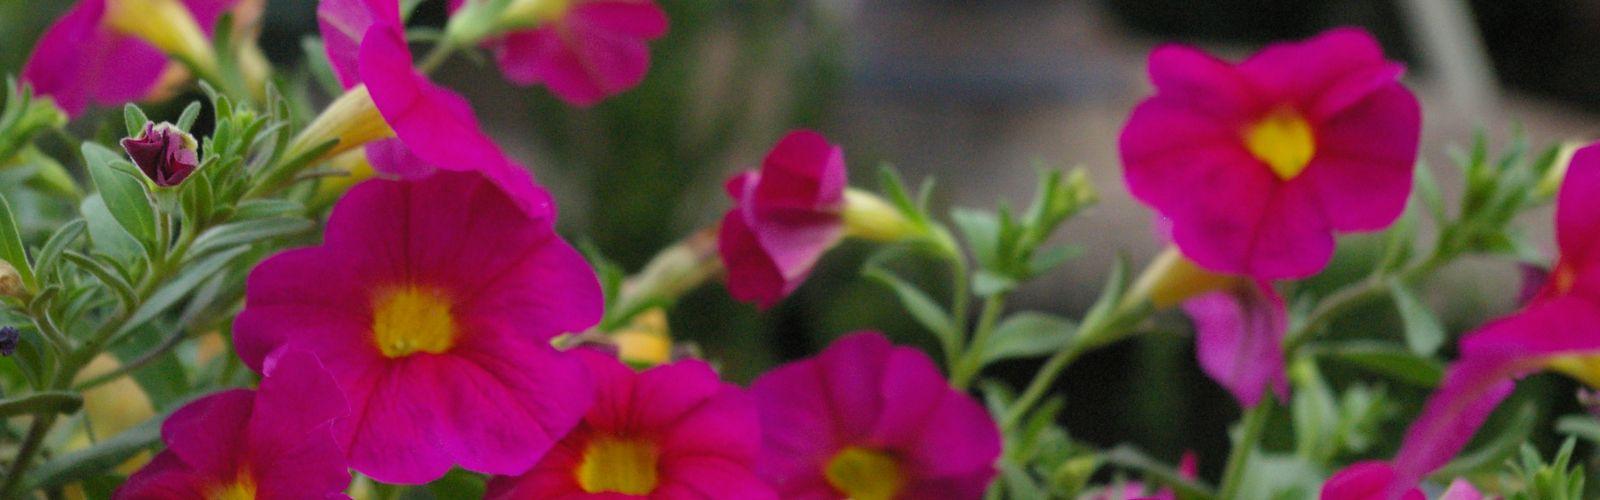 pink calibrachoa flowers